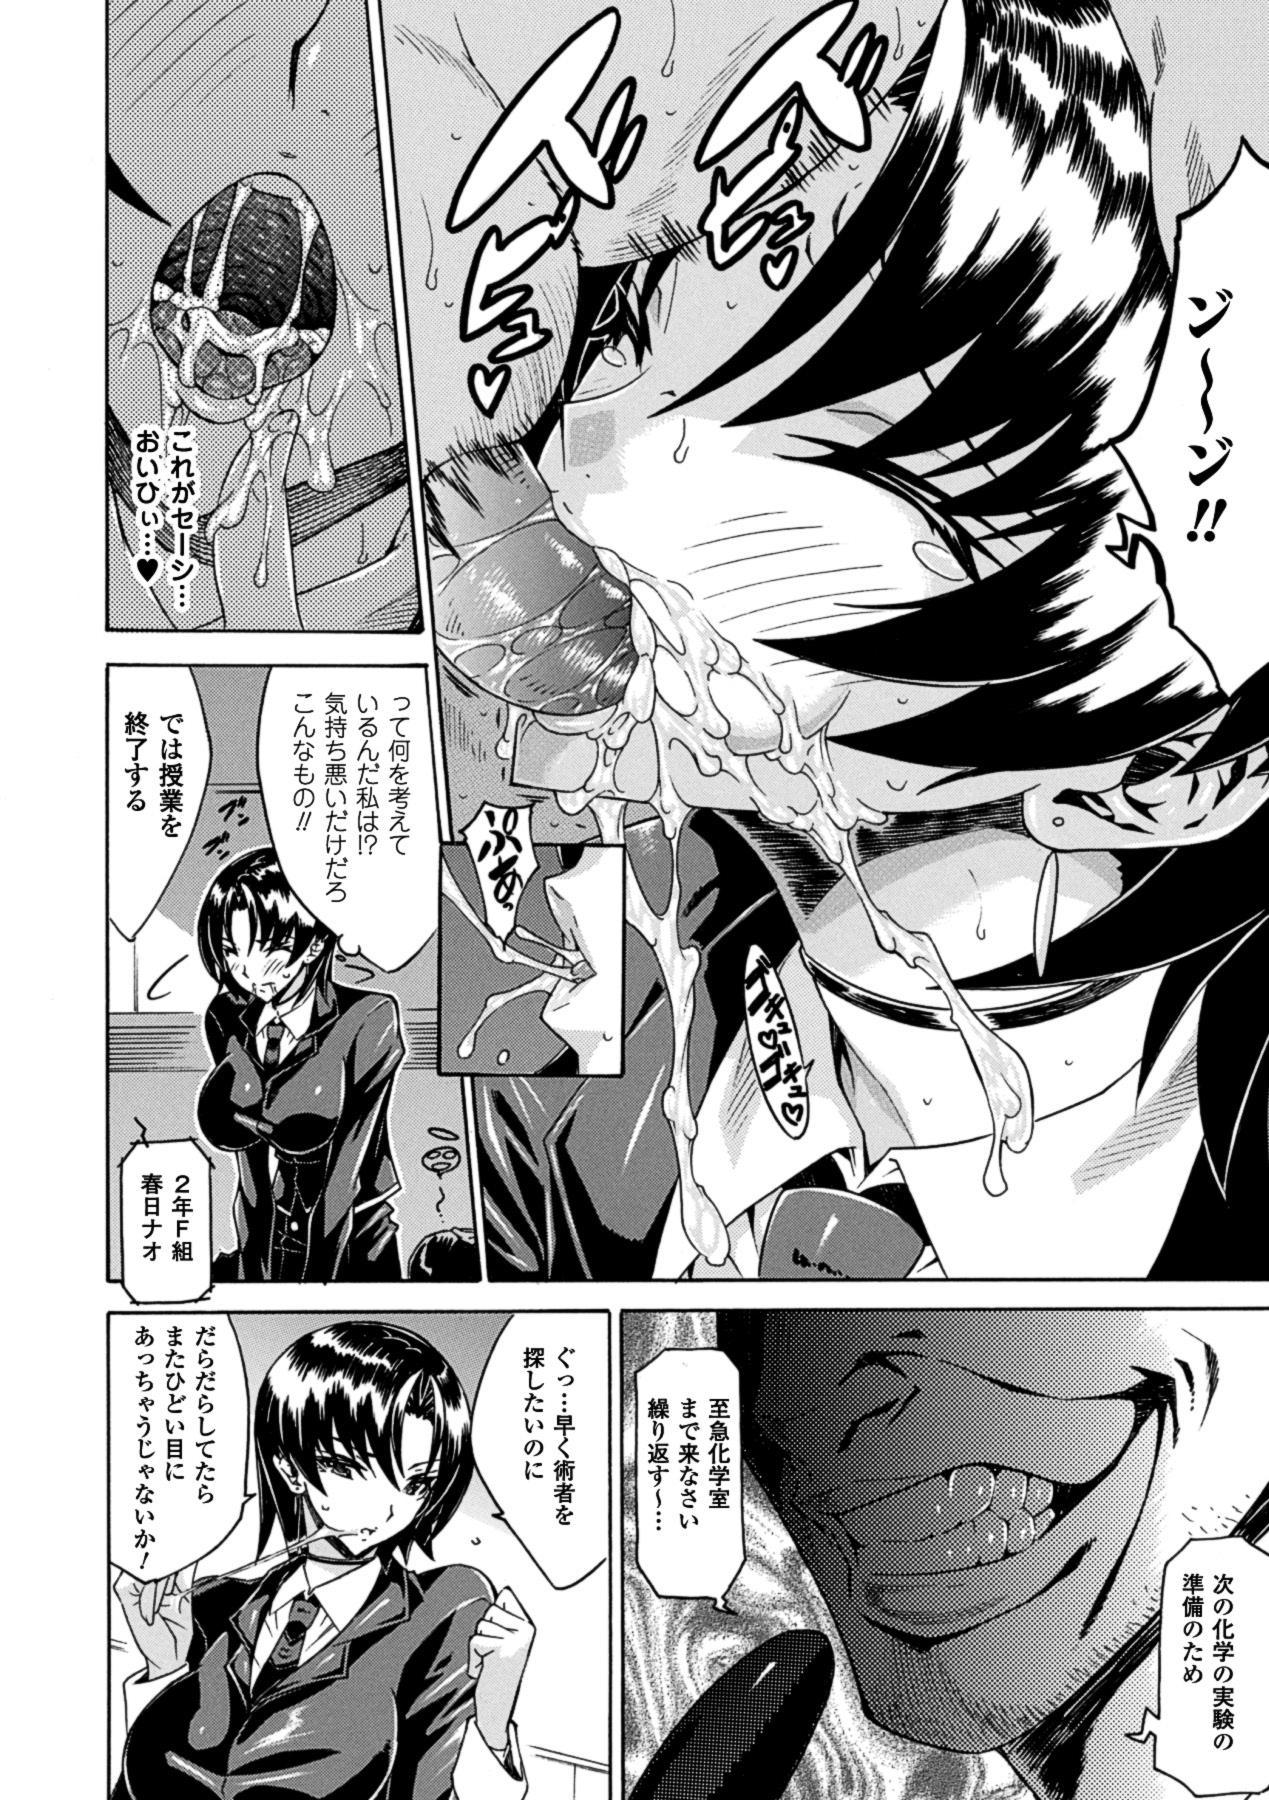 Megami Crisis 10 163